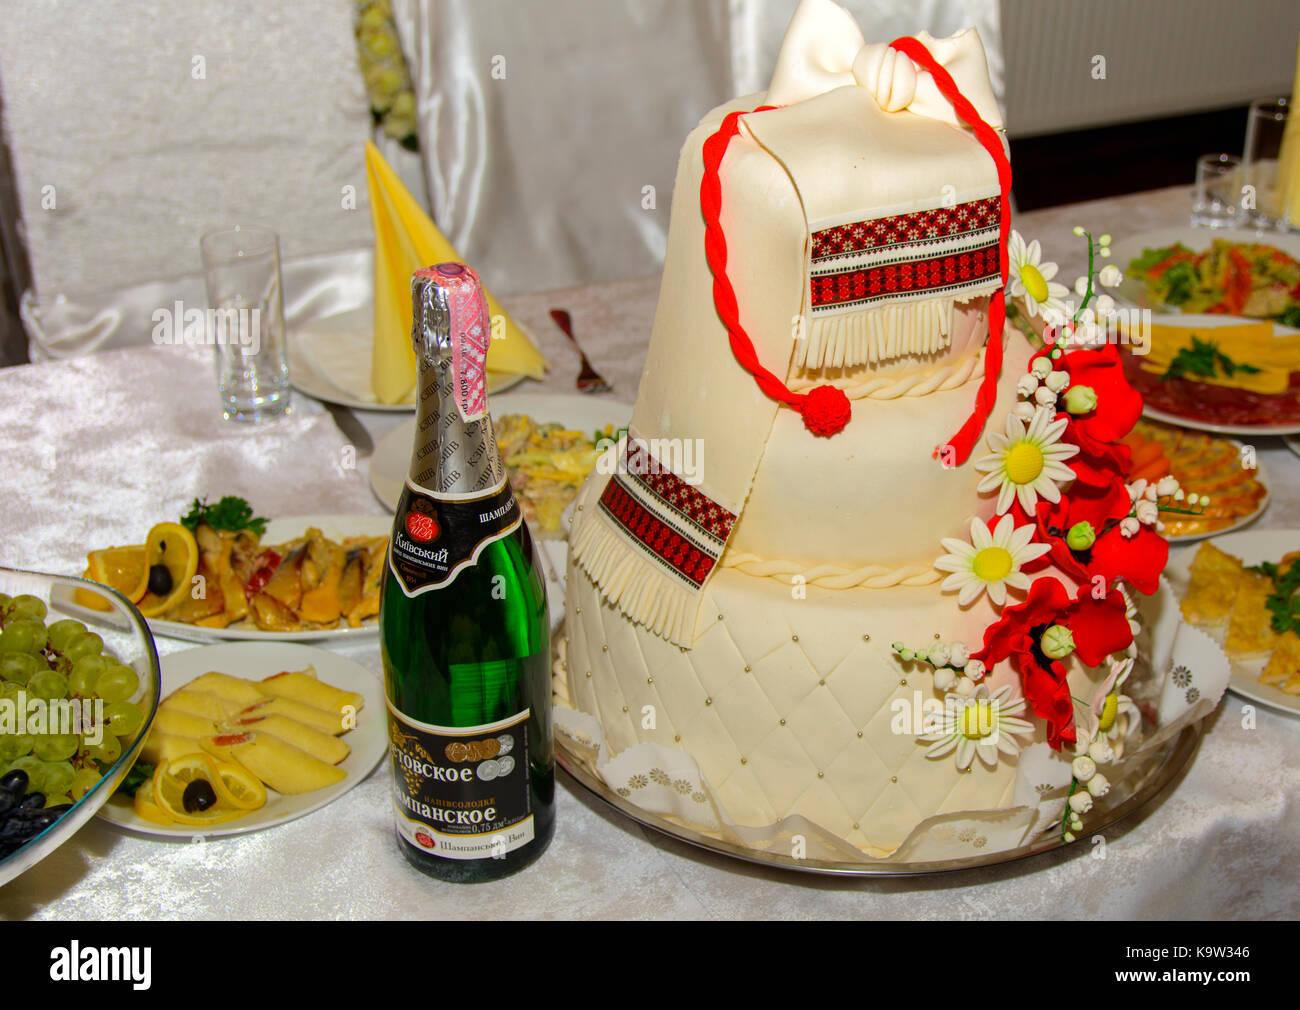 Sugar Powdered Wedding Cake Stock Photos & Sugar Powdered Wedding ...